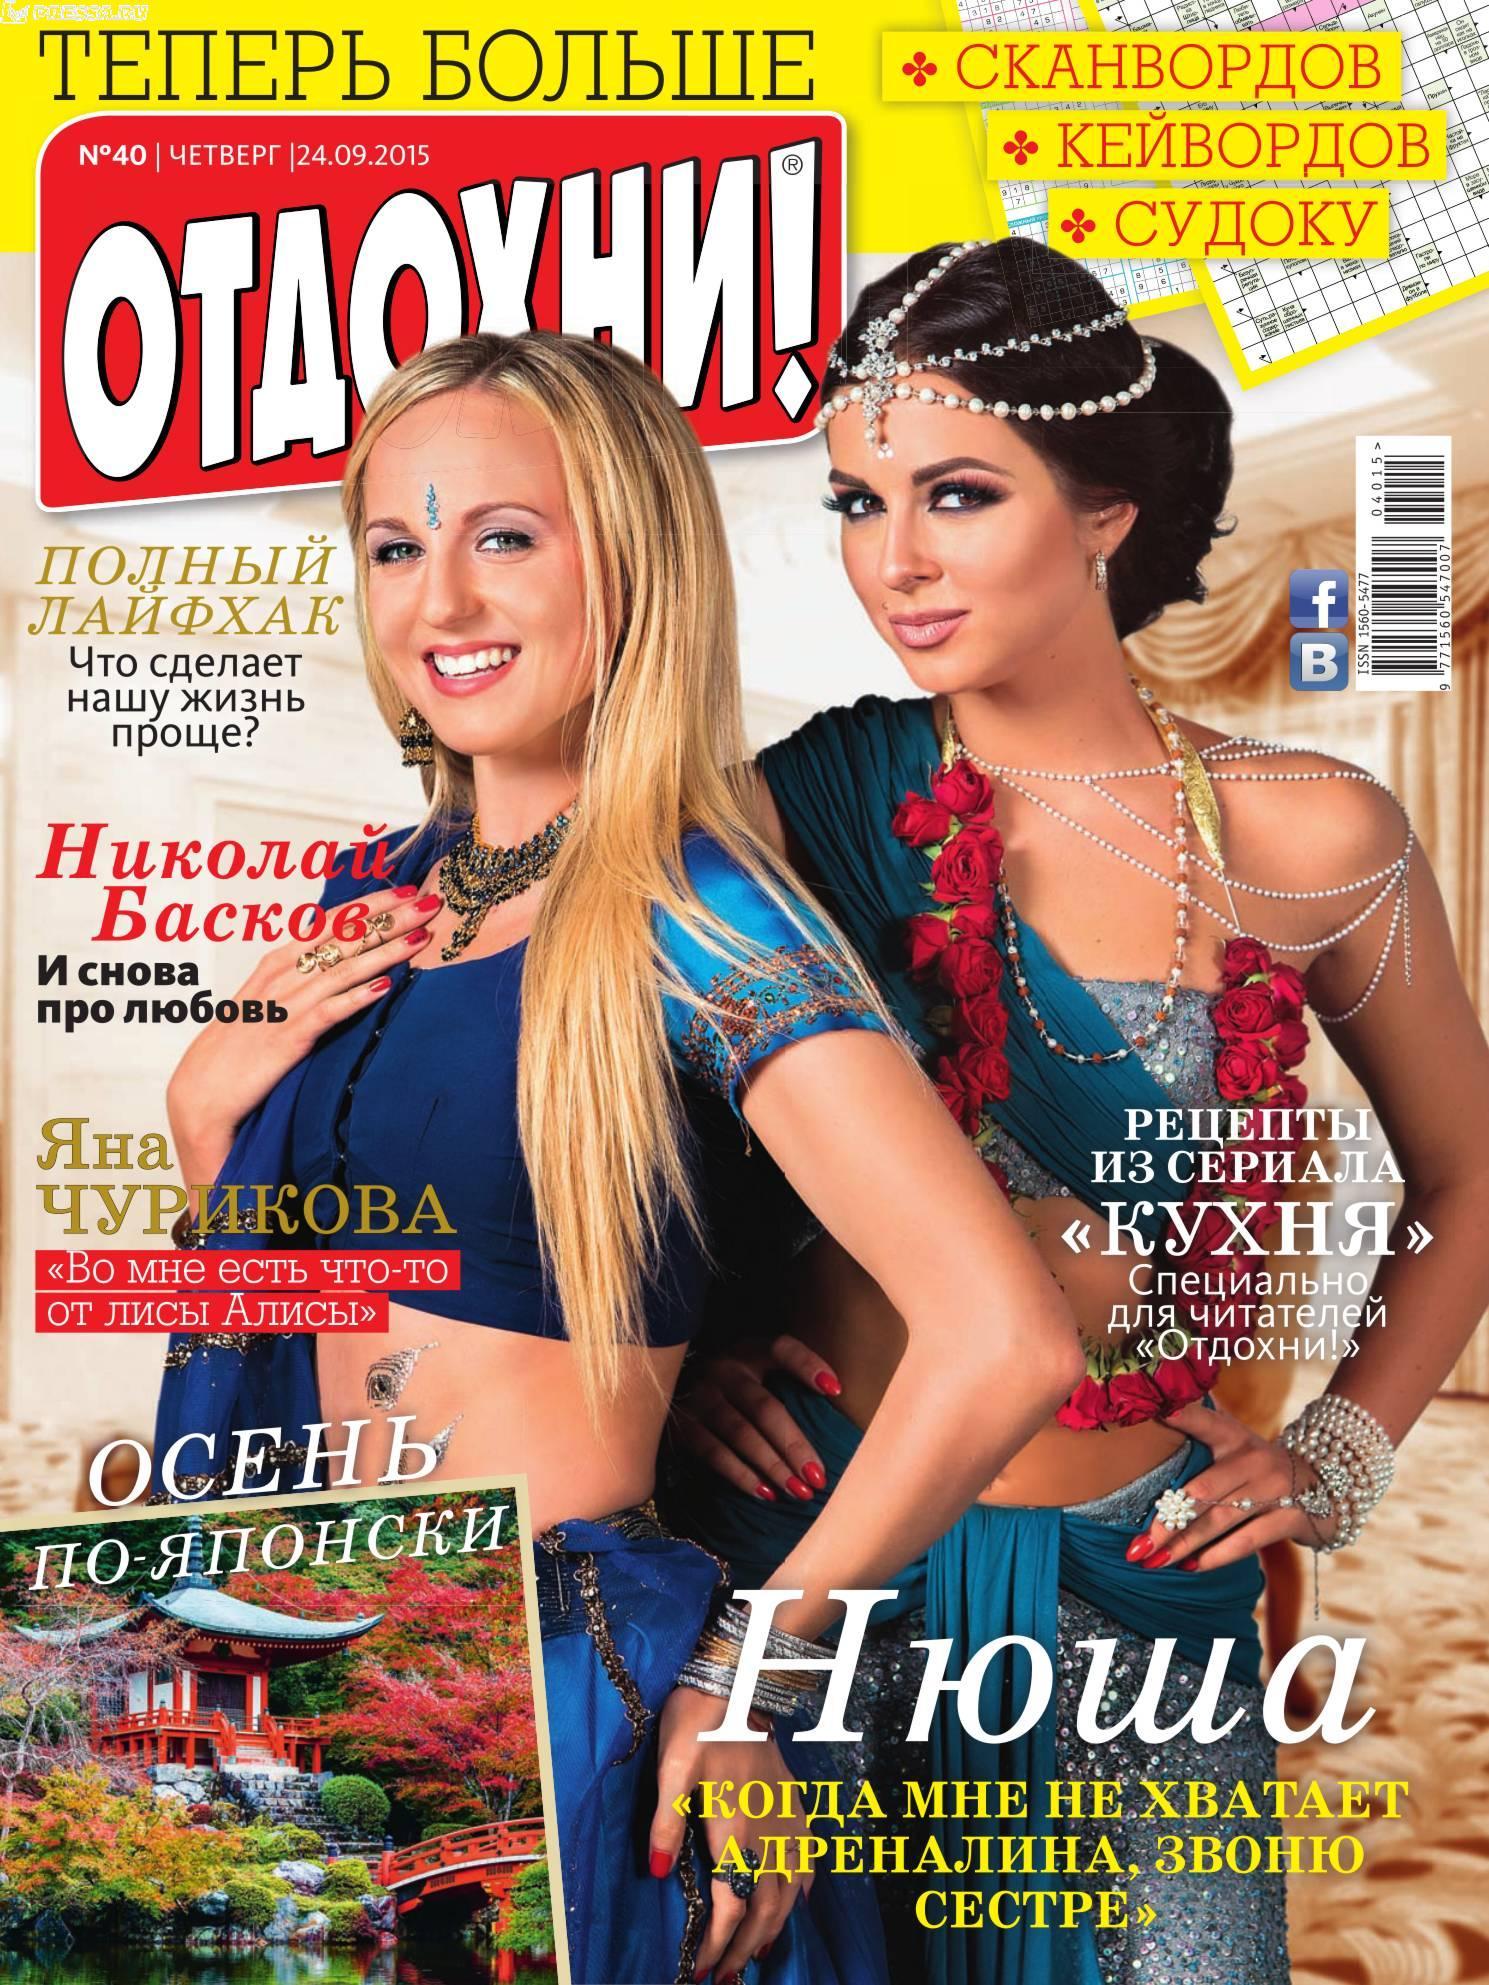 https://img-fotki.yandex.ru/get/3111/123965731.3a/0_104871_aaa960e_orig.jpg